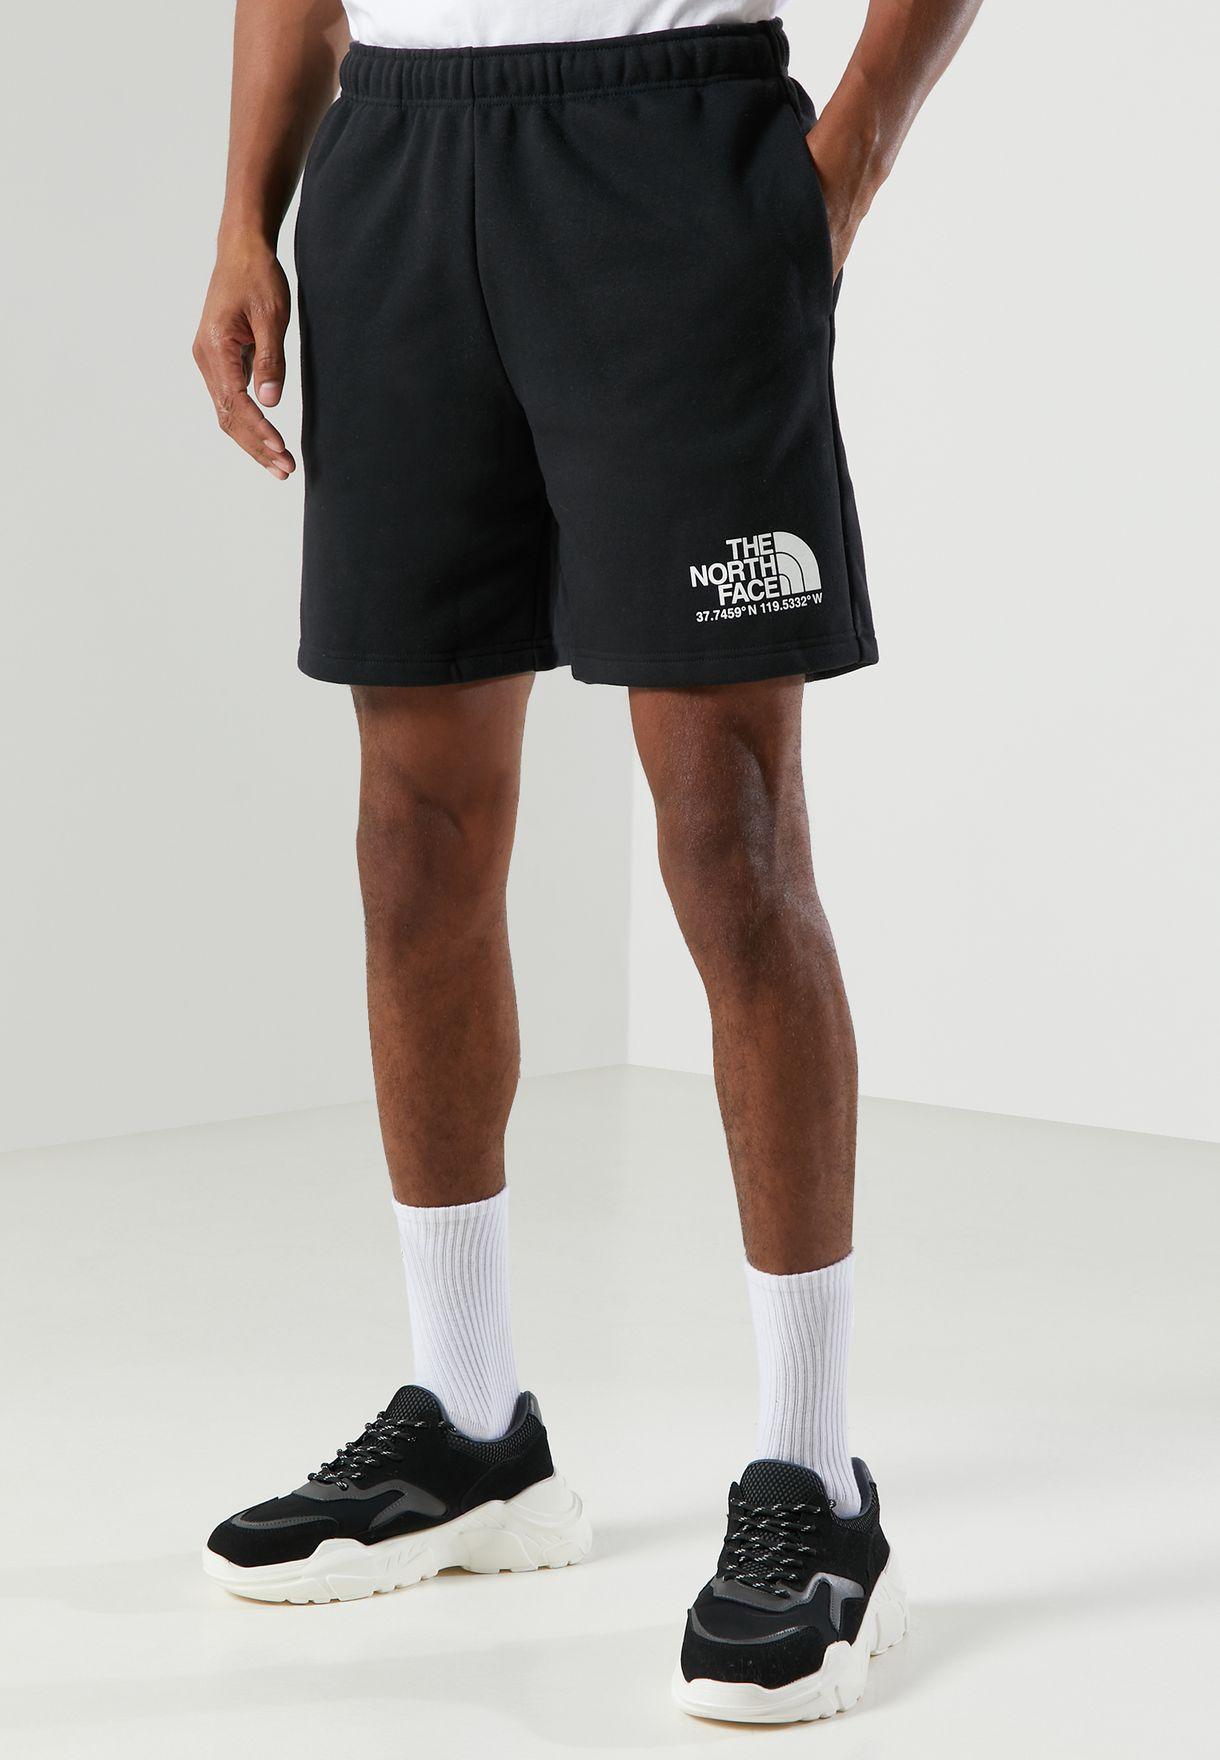 Coordinates Shorts